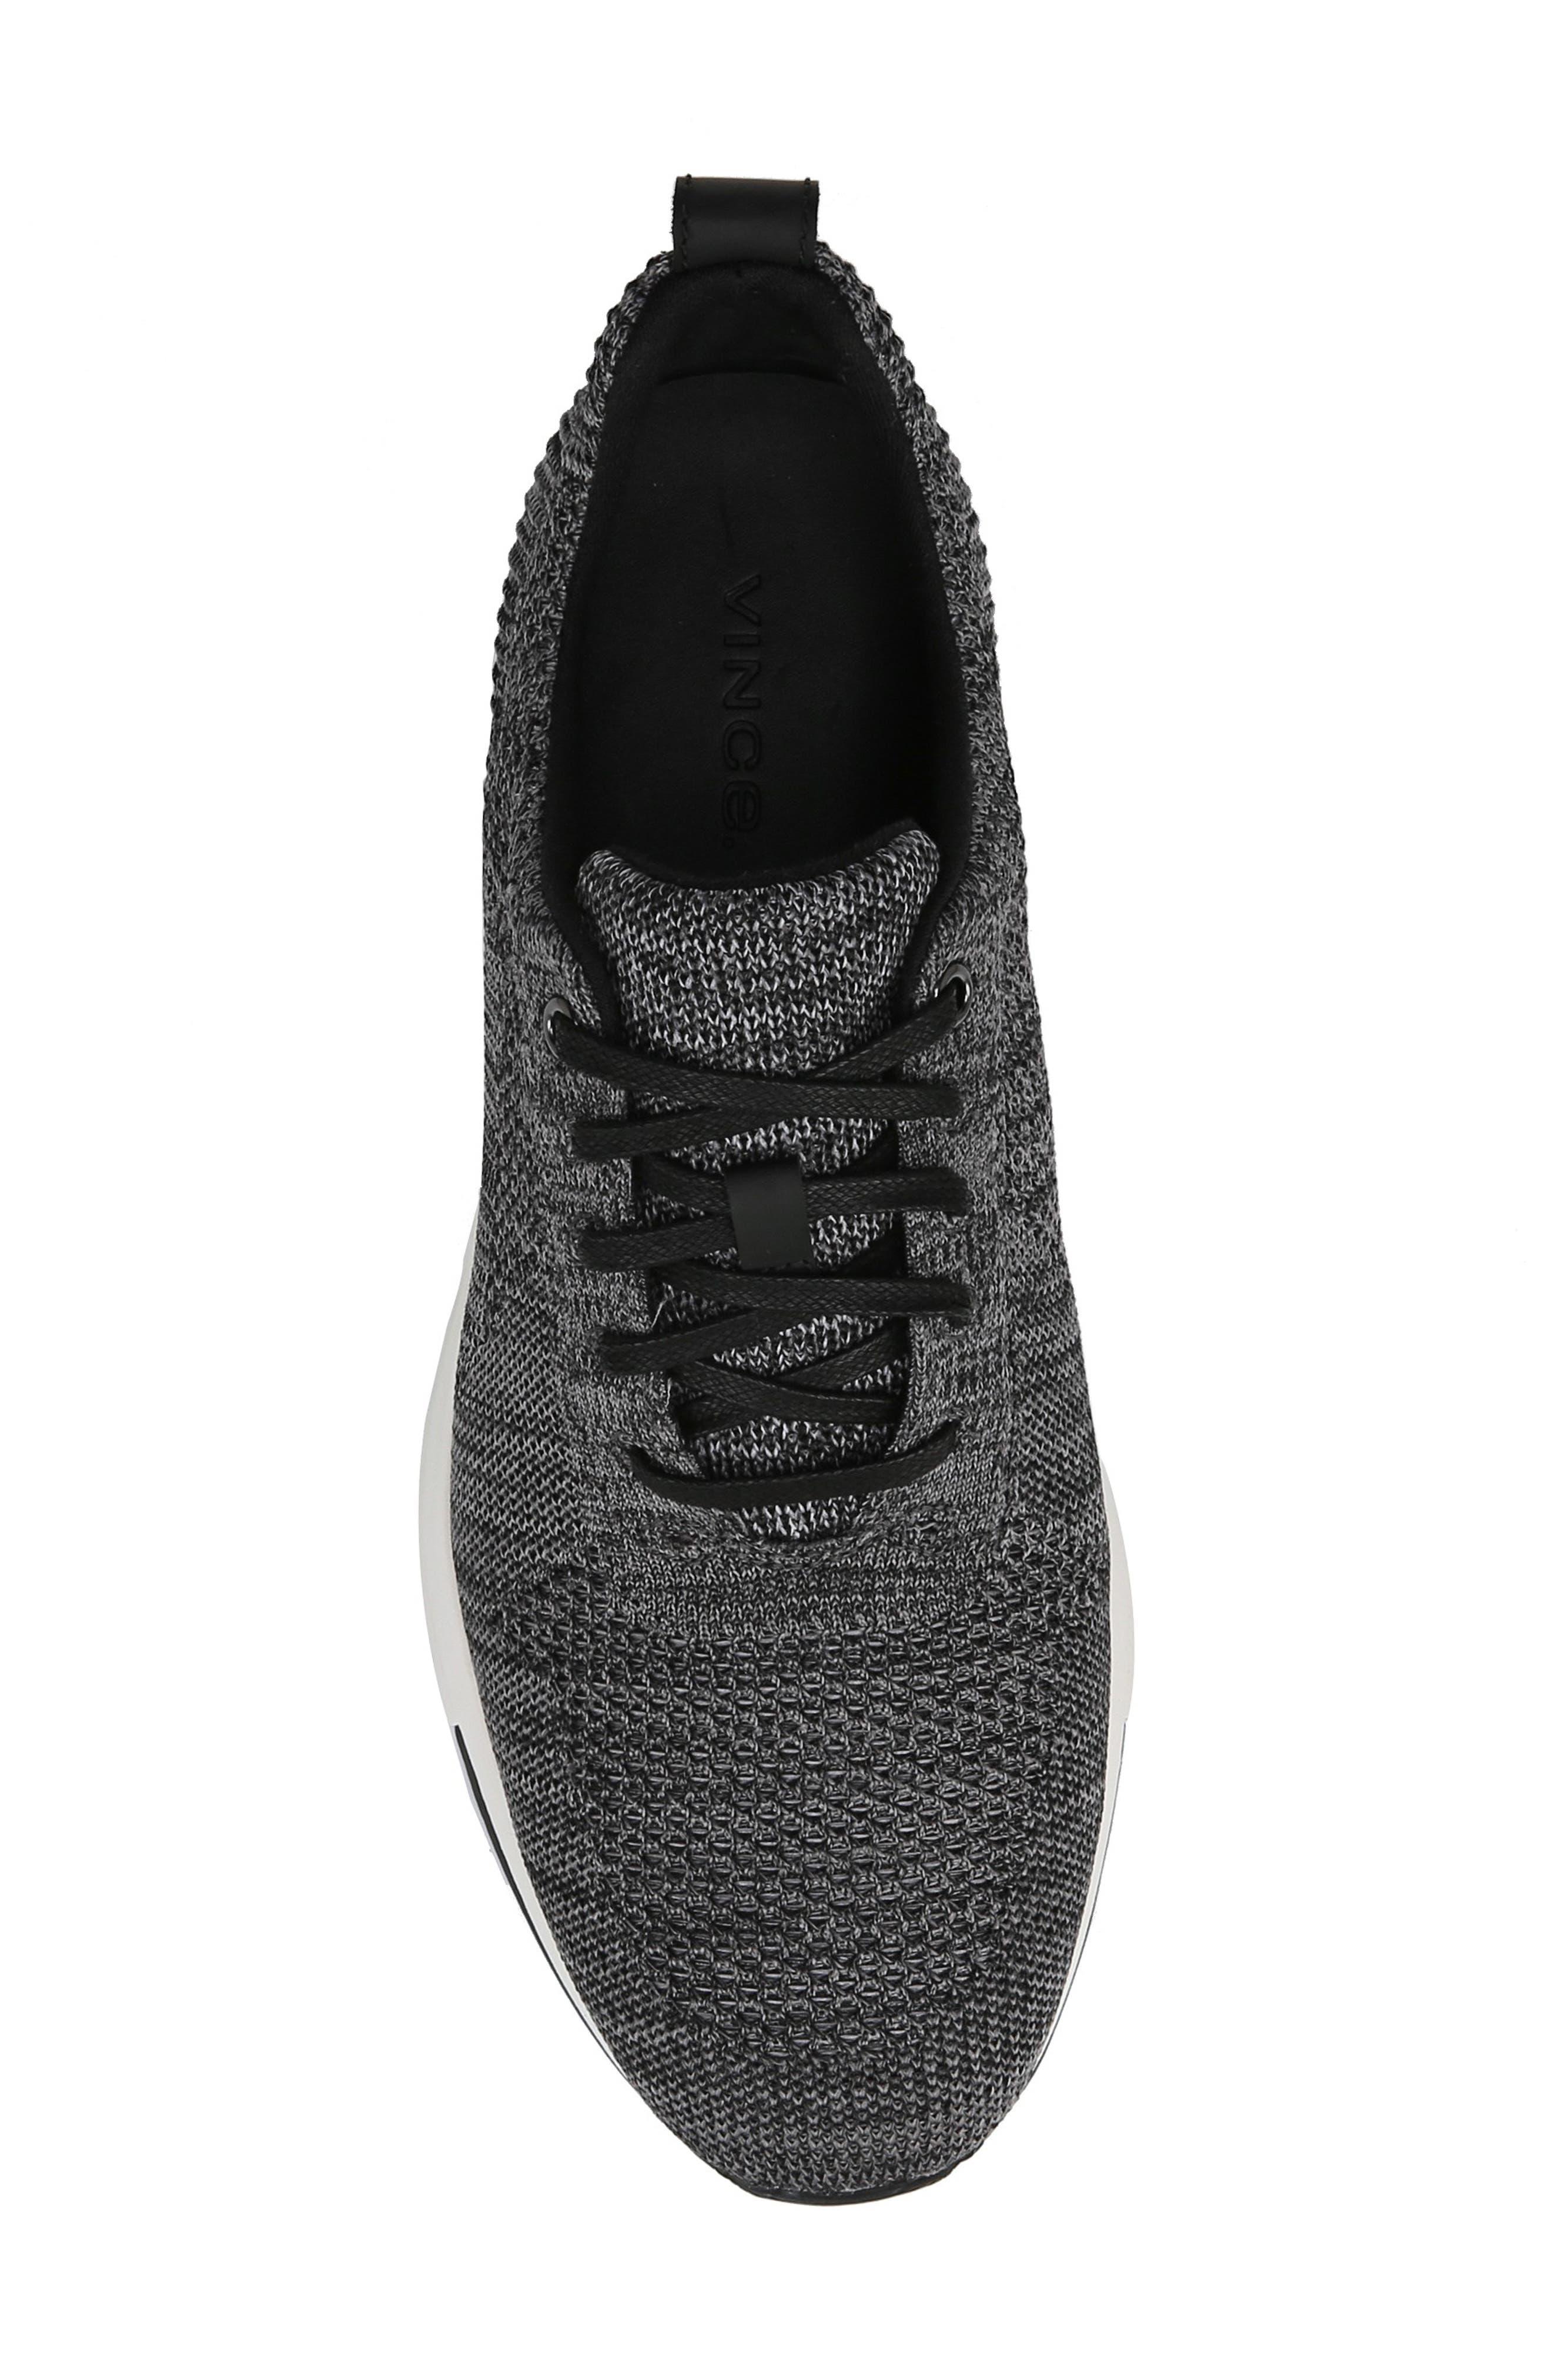 Palo Knit Sneaker,                             Alternate thumbnail 5, color,                             MARL GREY/ BLACK